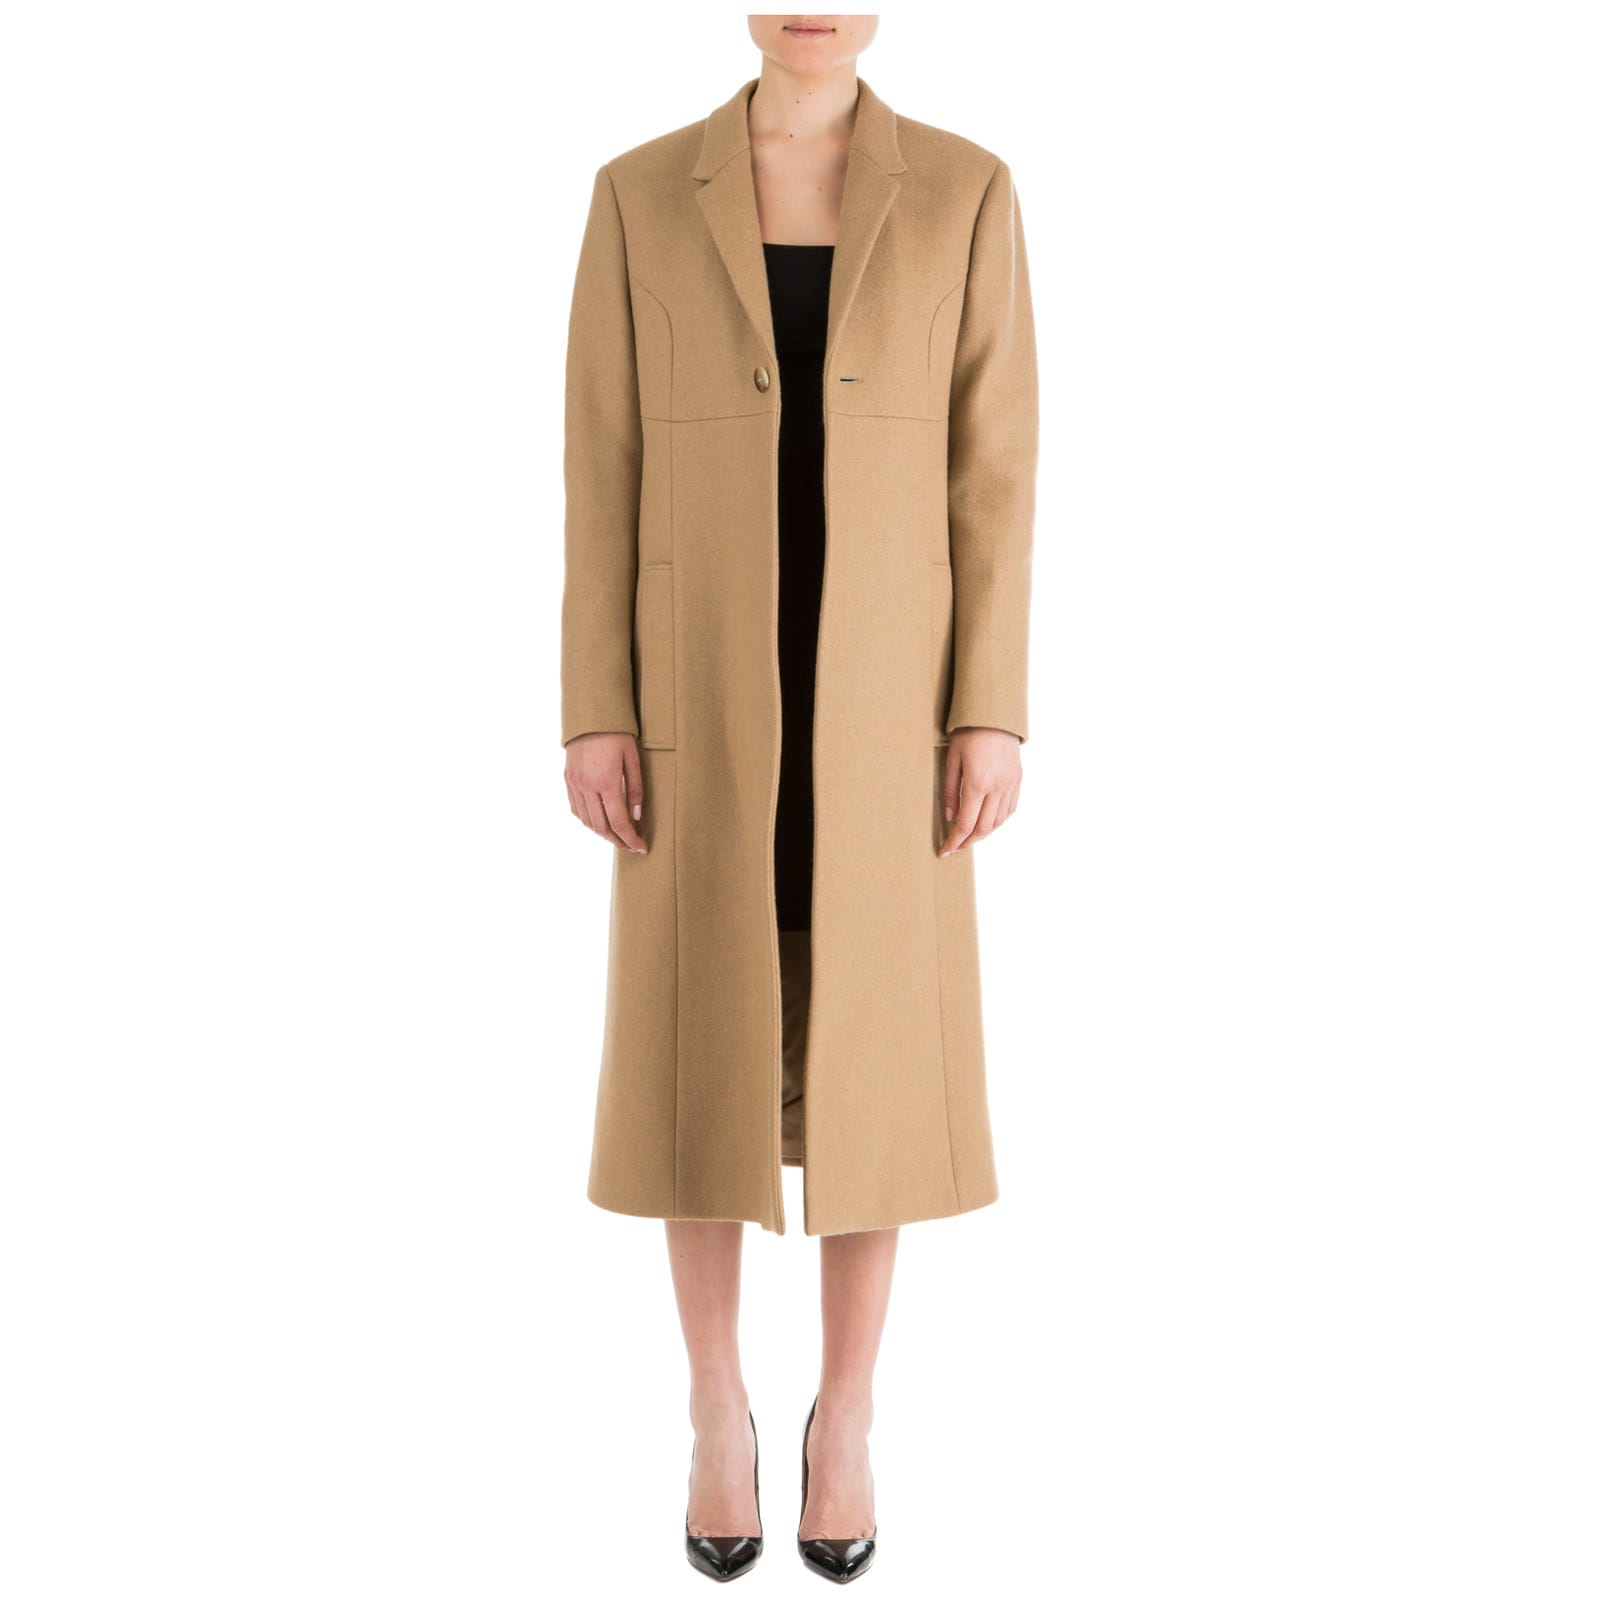 Neil Barrett Wool Coat